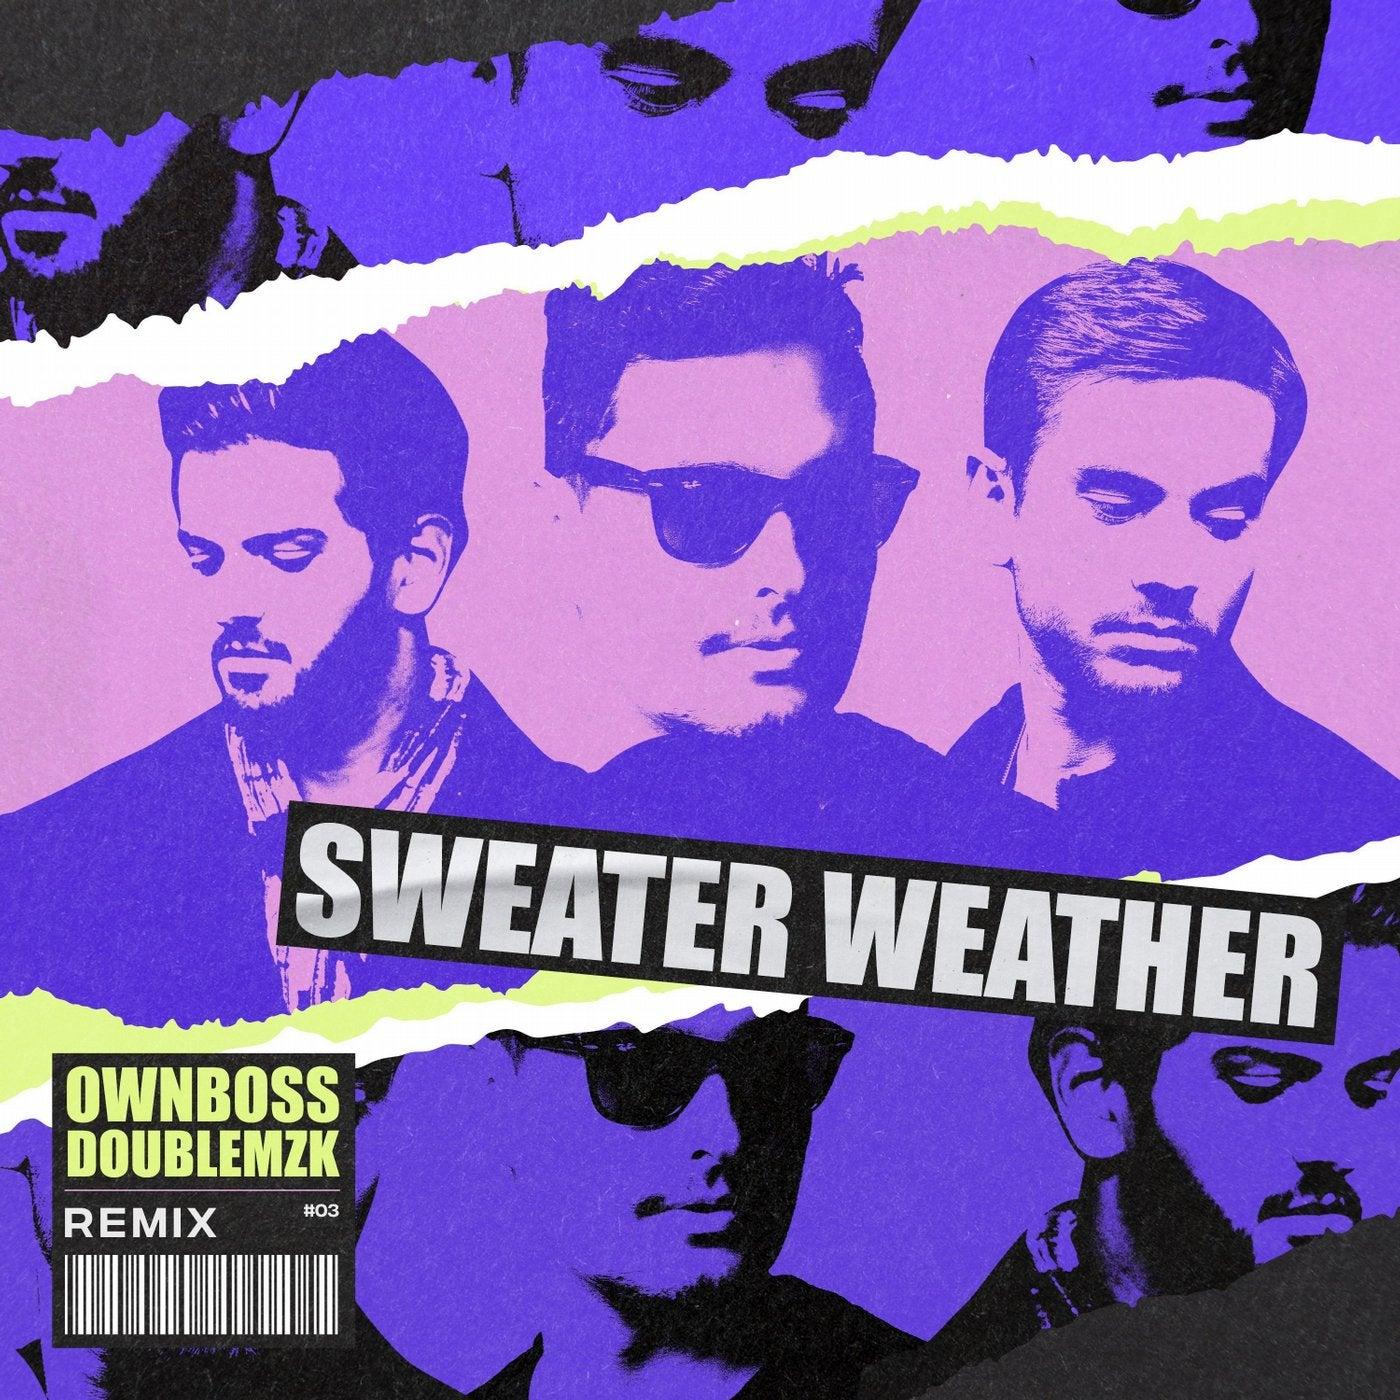 Sweater Weather (Remix)